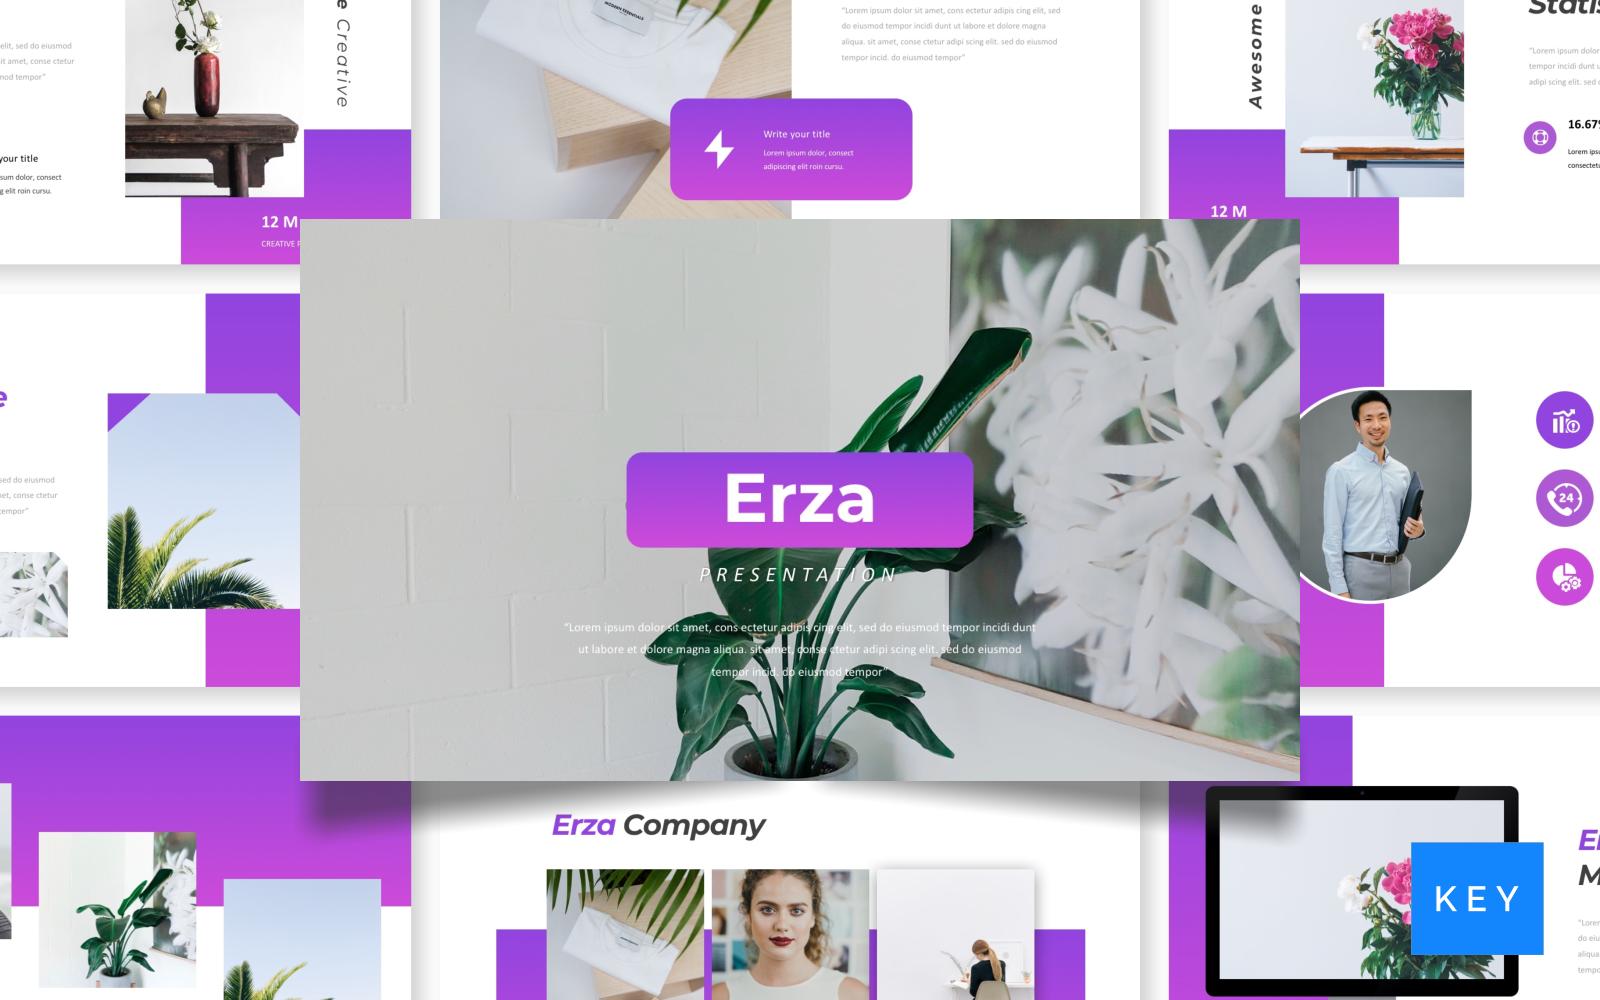 Erza - Creative Presentation Keynote Template